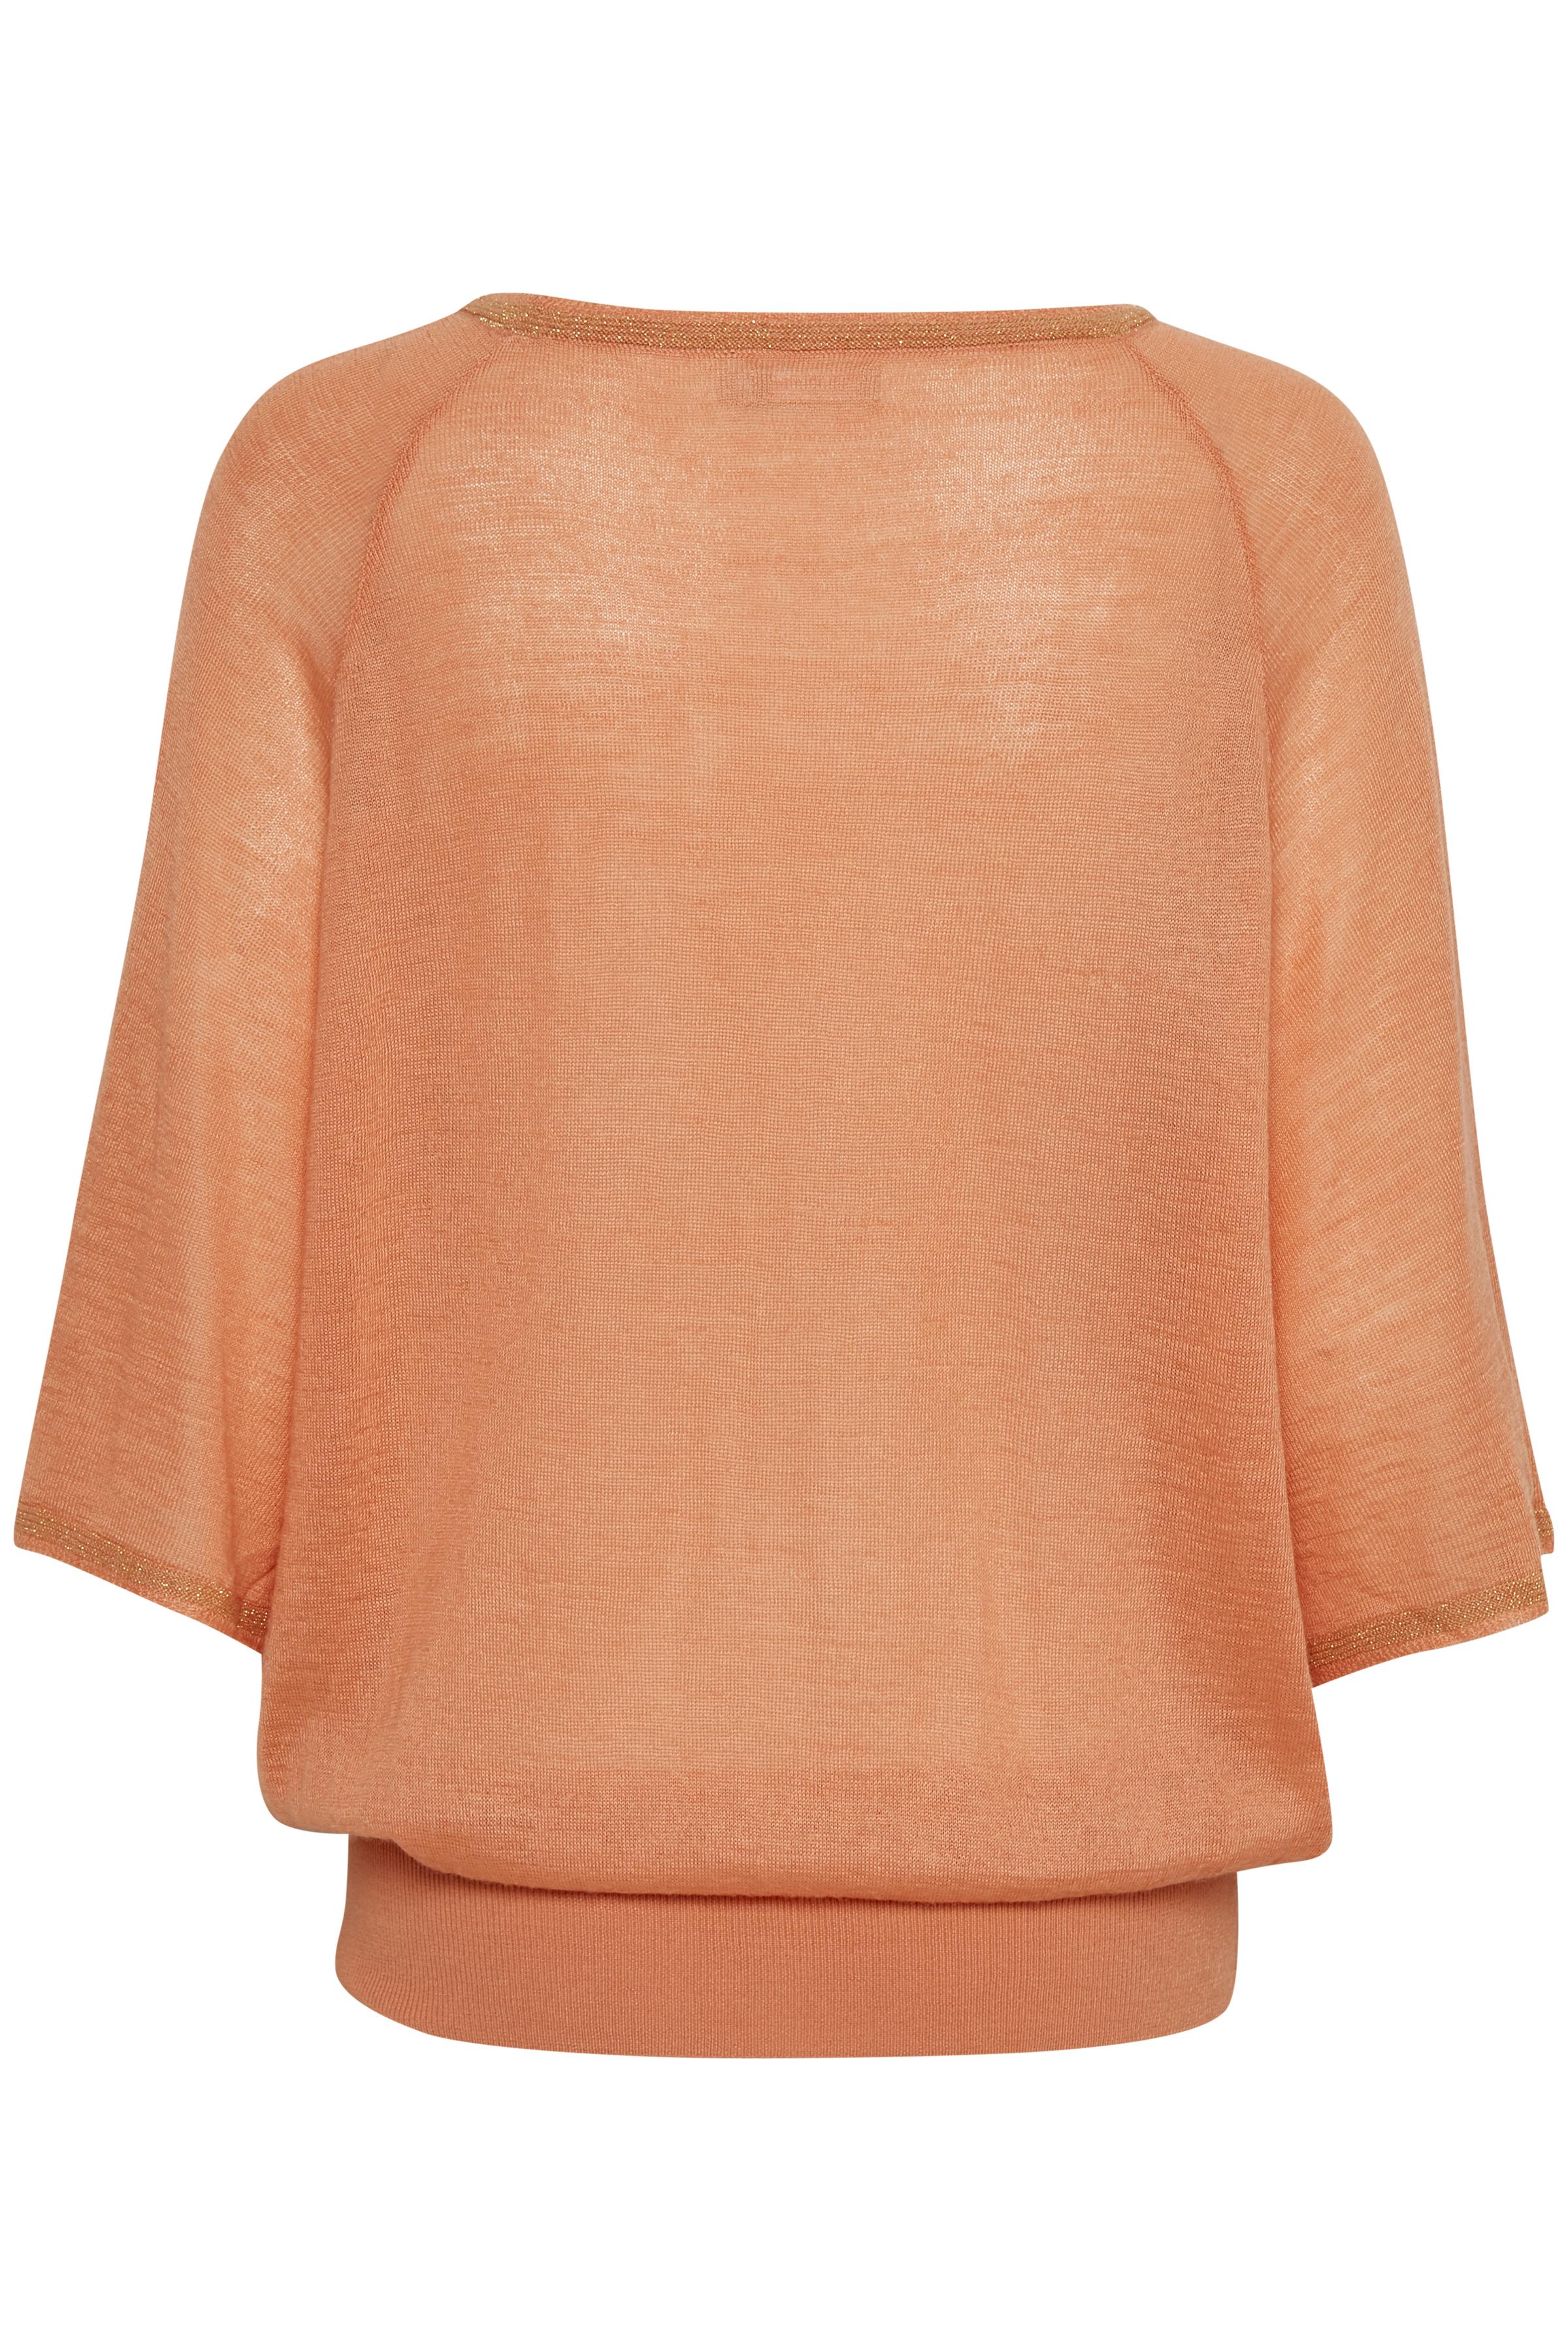 Koralle Kurzarm-Bluse von Bon'A Parte – Shoppen SieKoralle Kurzarm-Bluse ab Gr. S-2XL hier